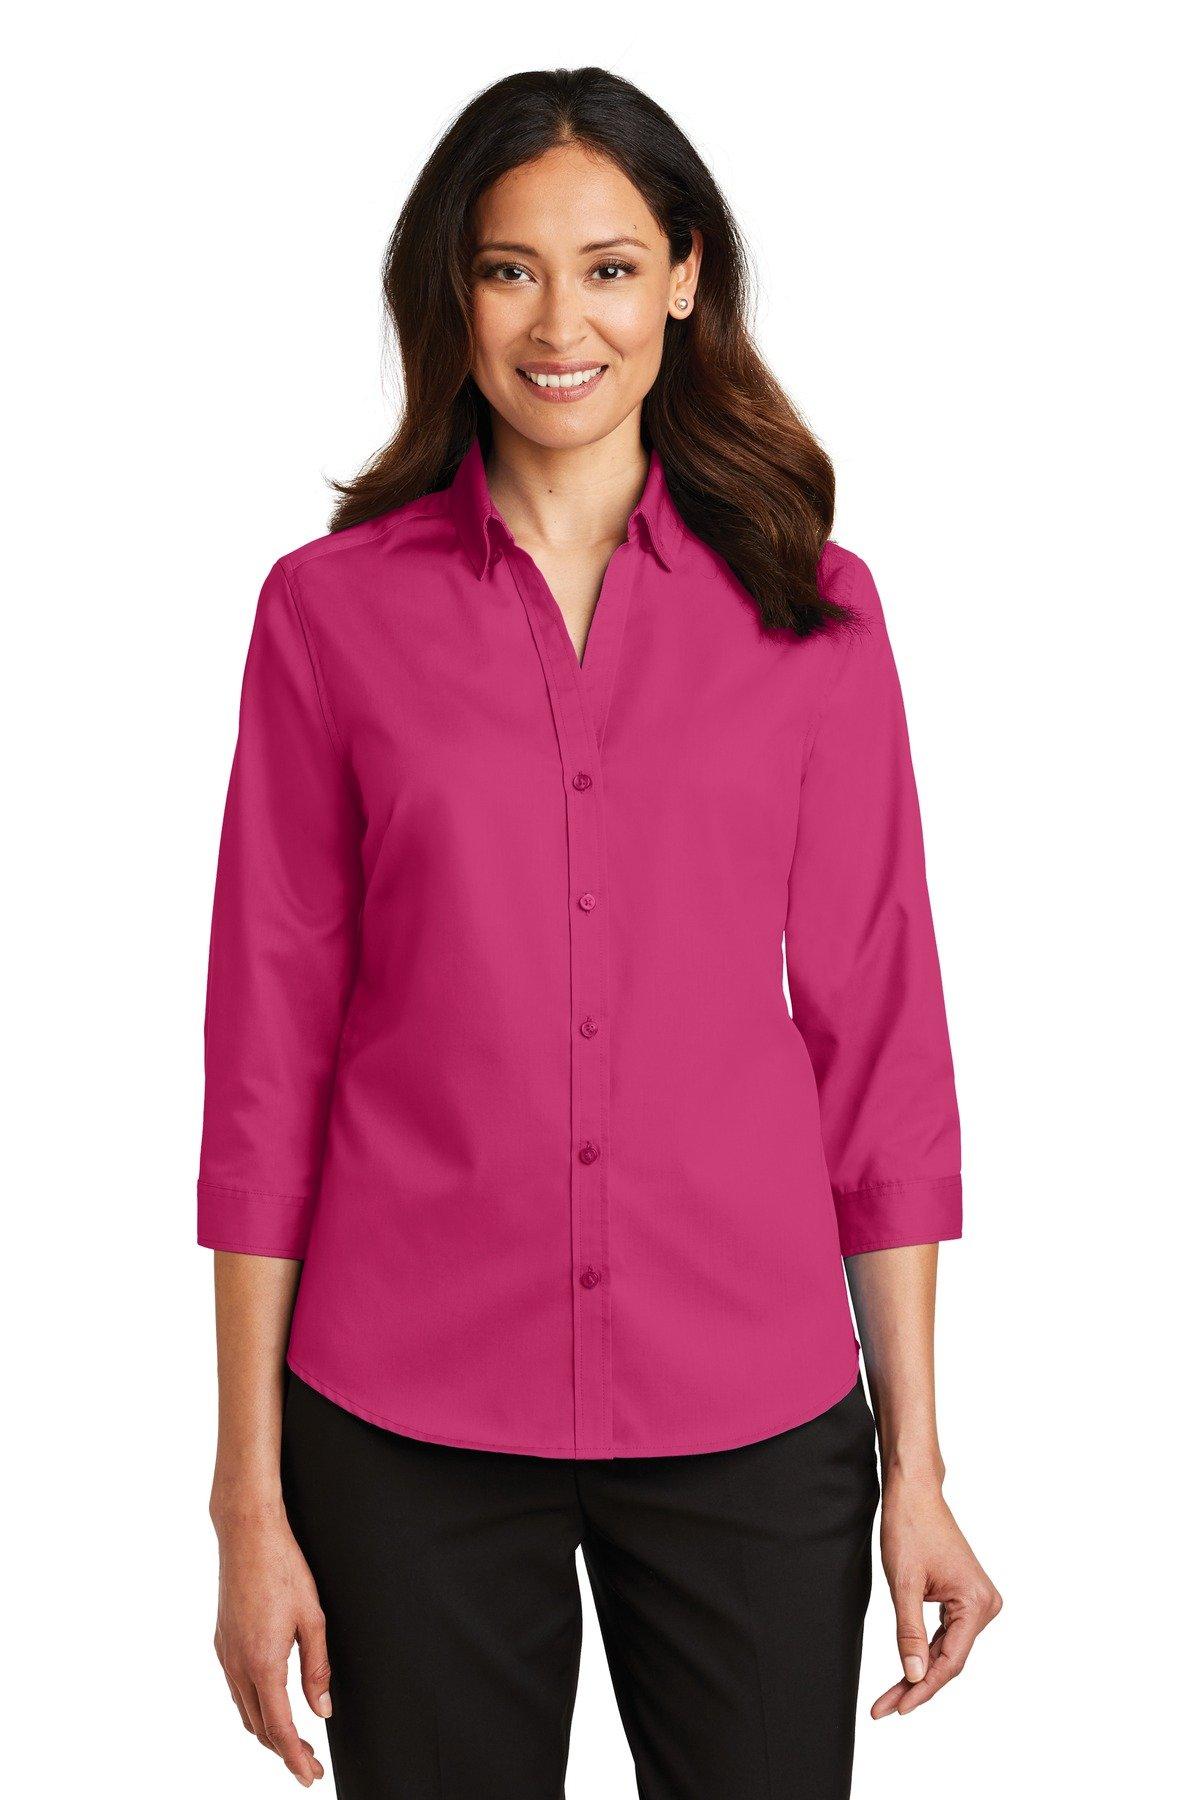 Port Authority Ladies 3/4-Sleeve SuperPro Twill Shirt 4XL Pink Azalea